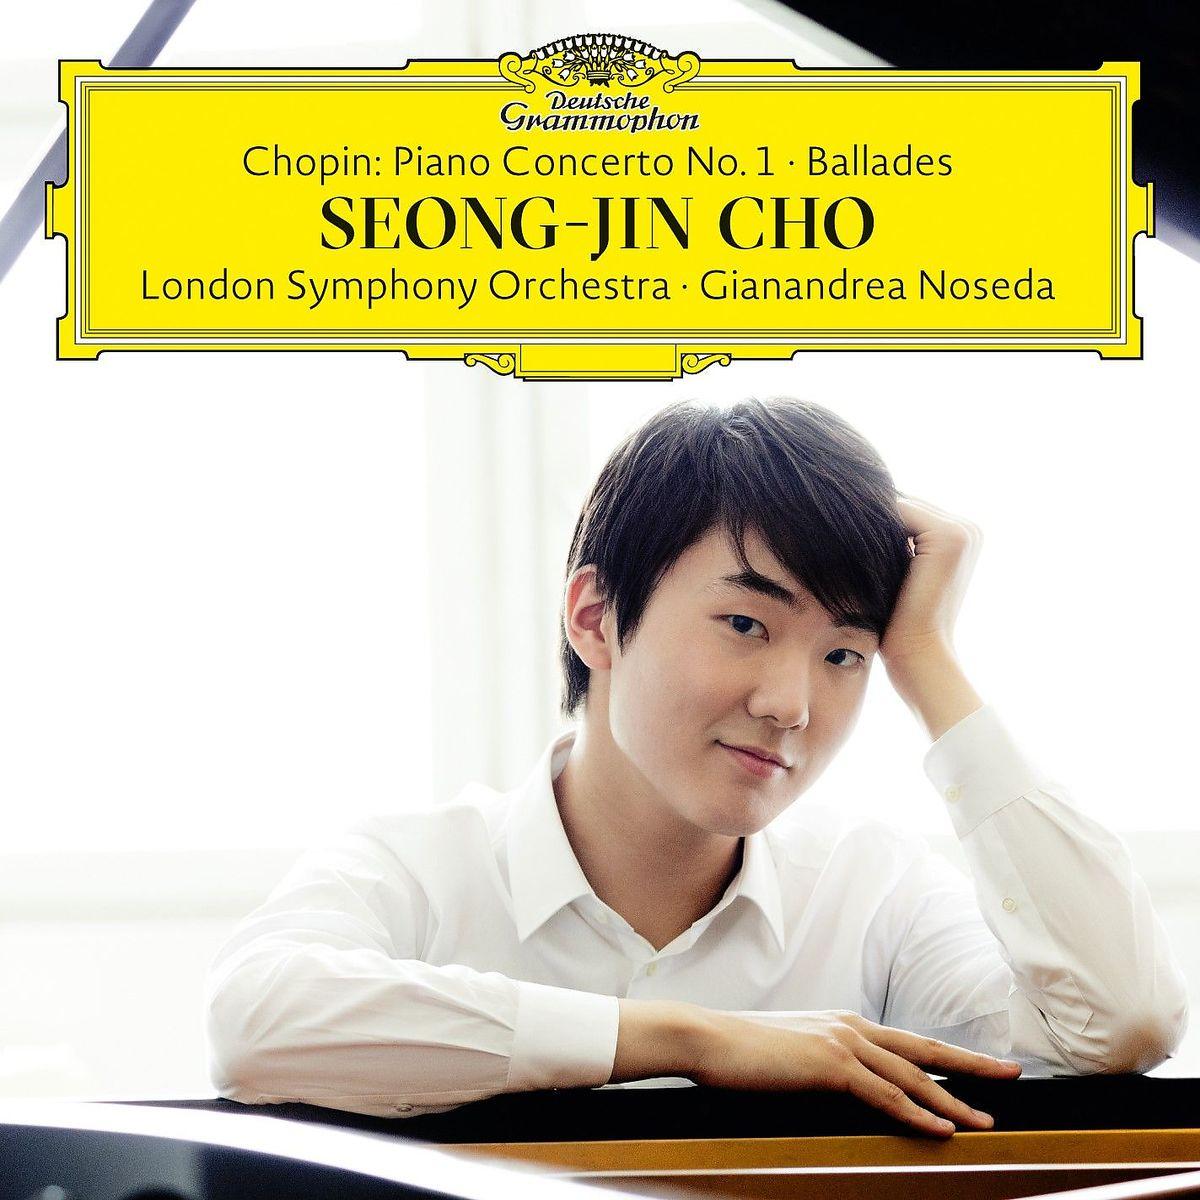 piano-concerto-no-1-ballades-cms-source